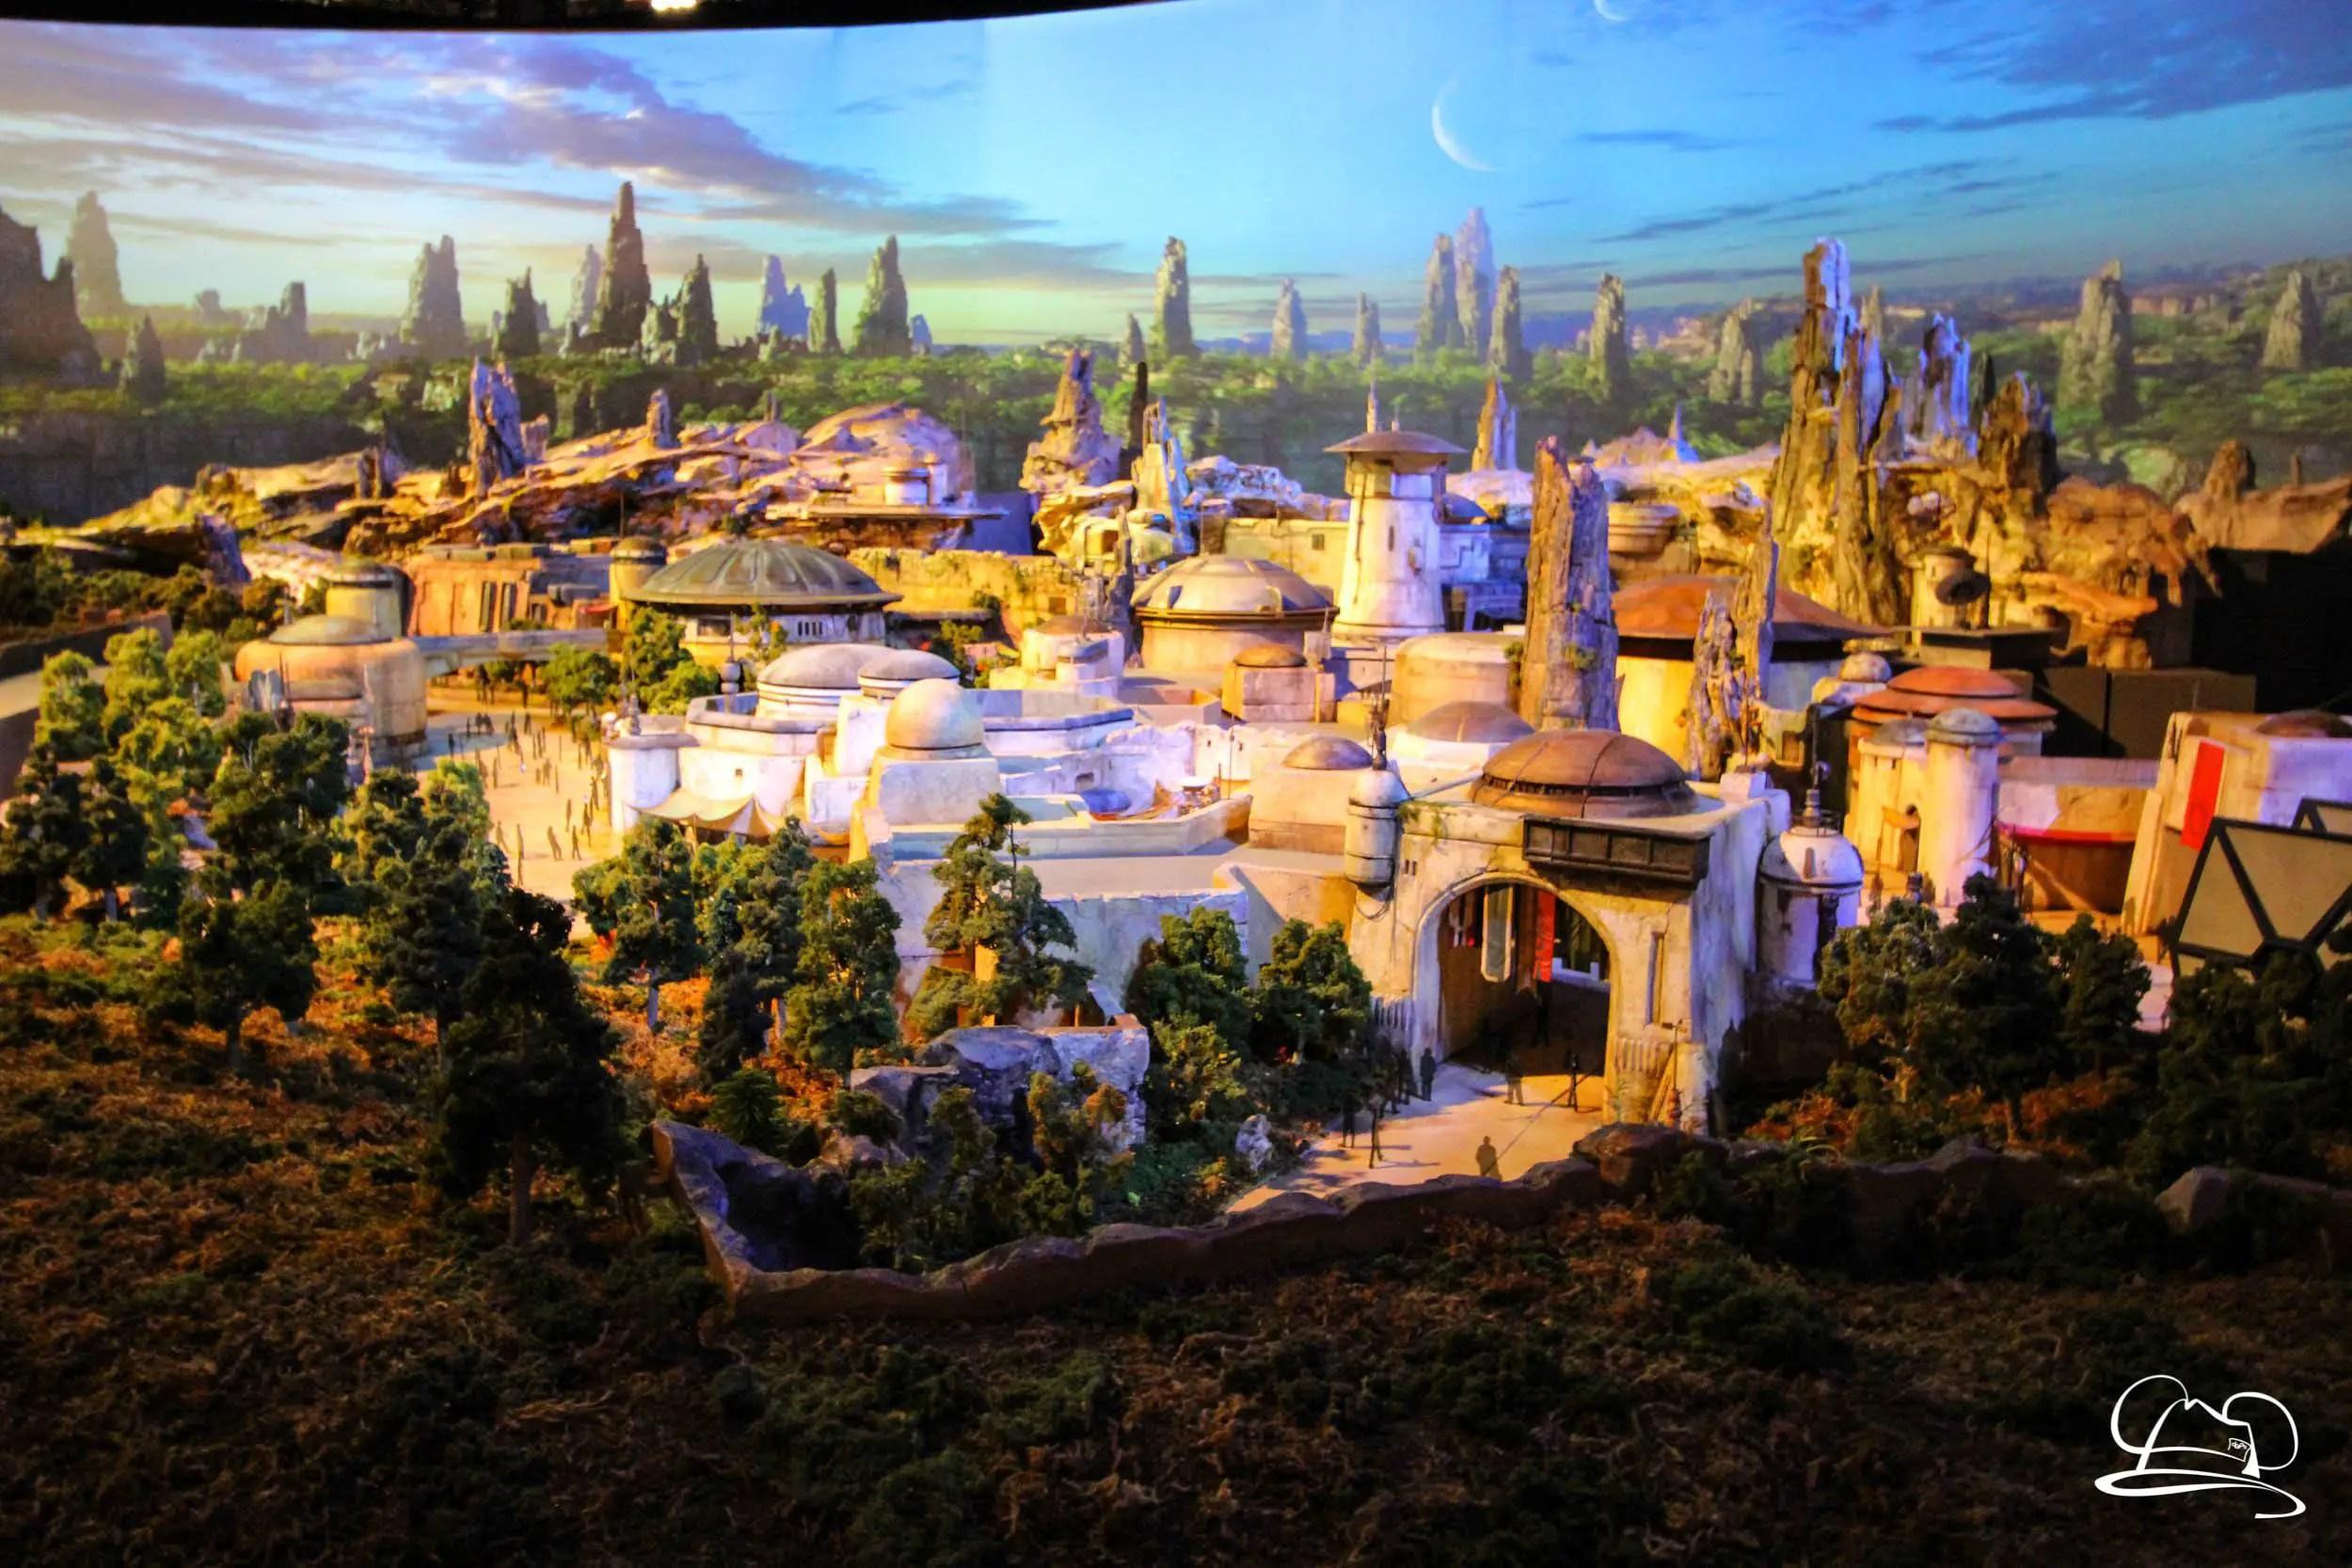 Star Wars: Galaxy's Edge Model